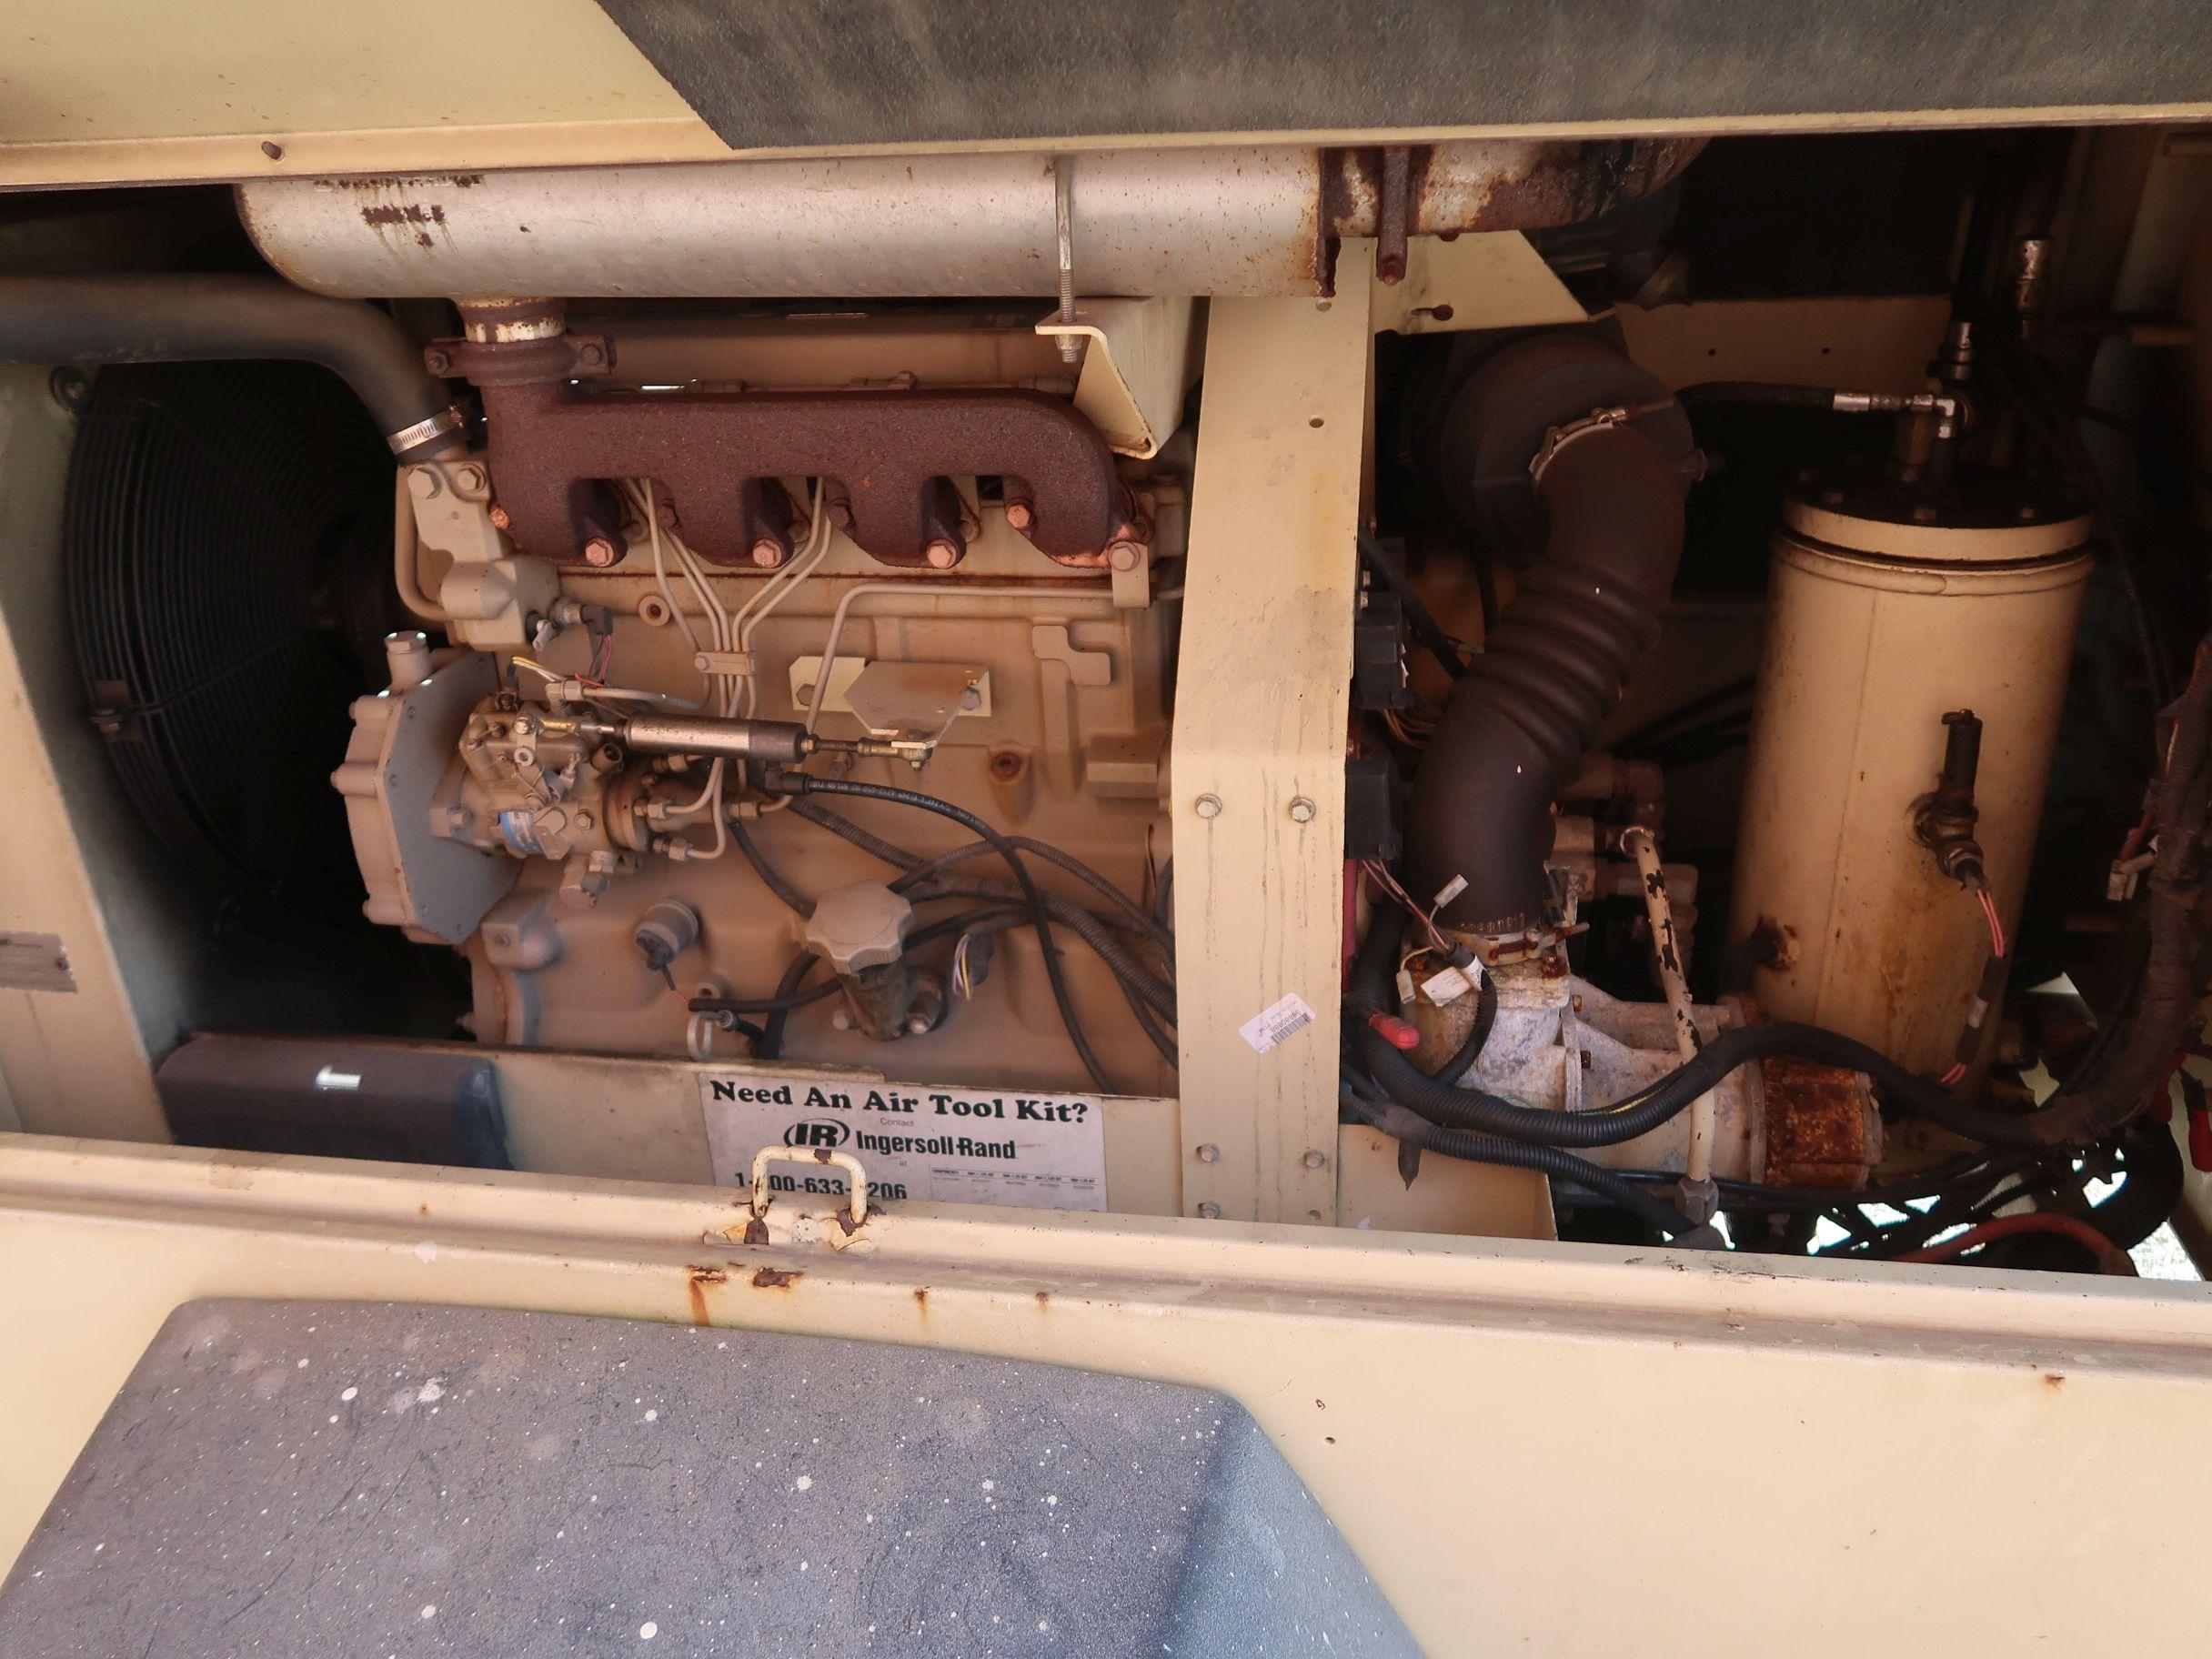 Lot 1005 - INGERSOLL RAND MODEL XP185 DIESEL POWERED TRAILER MOUNTED AIR COMPRESSOR, 4 CYCLINDER, JOHN DEERE